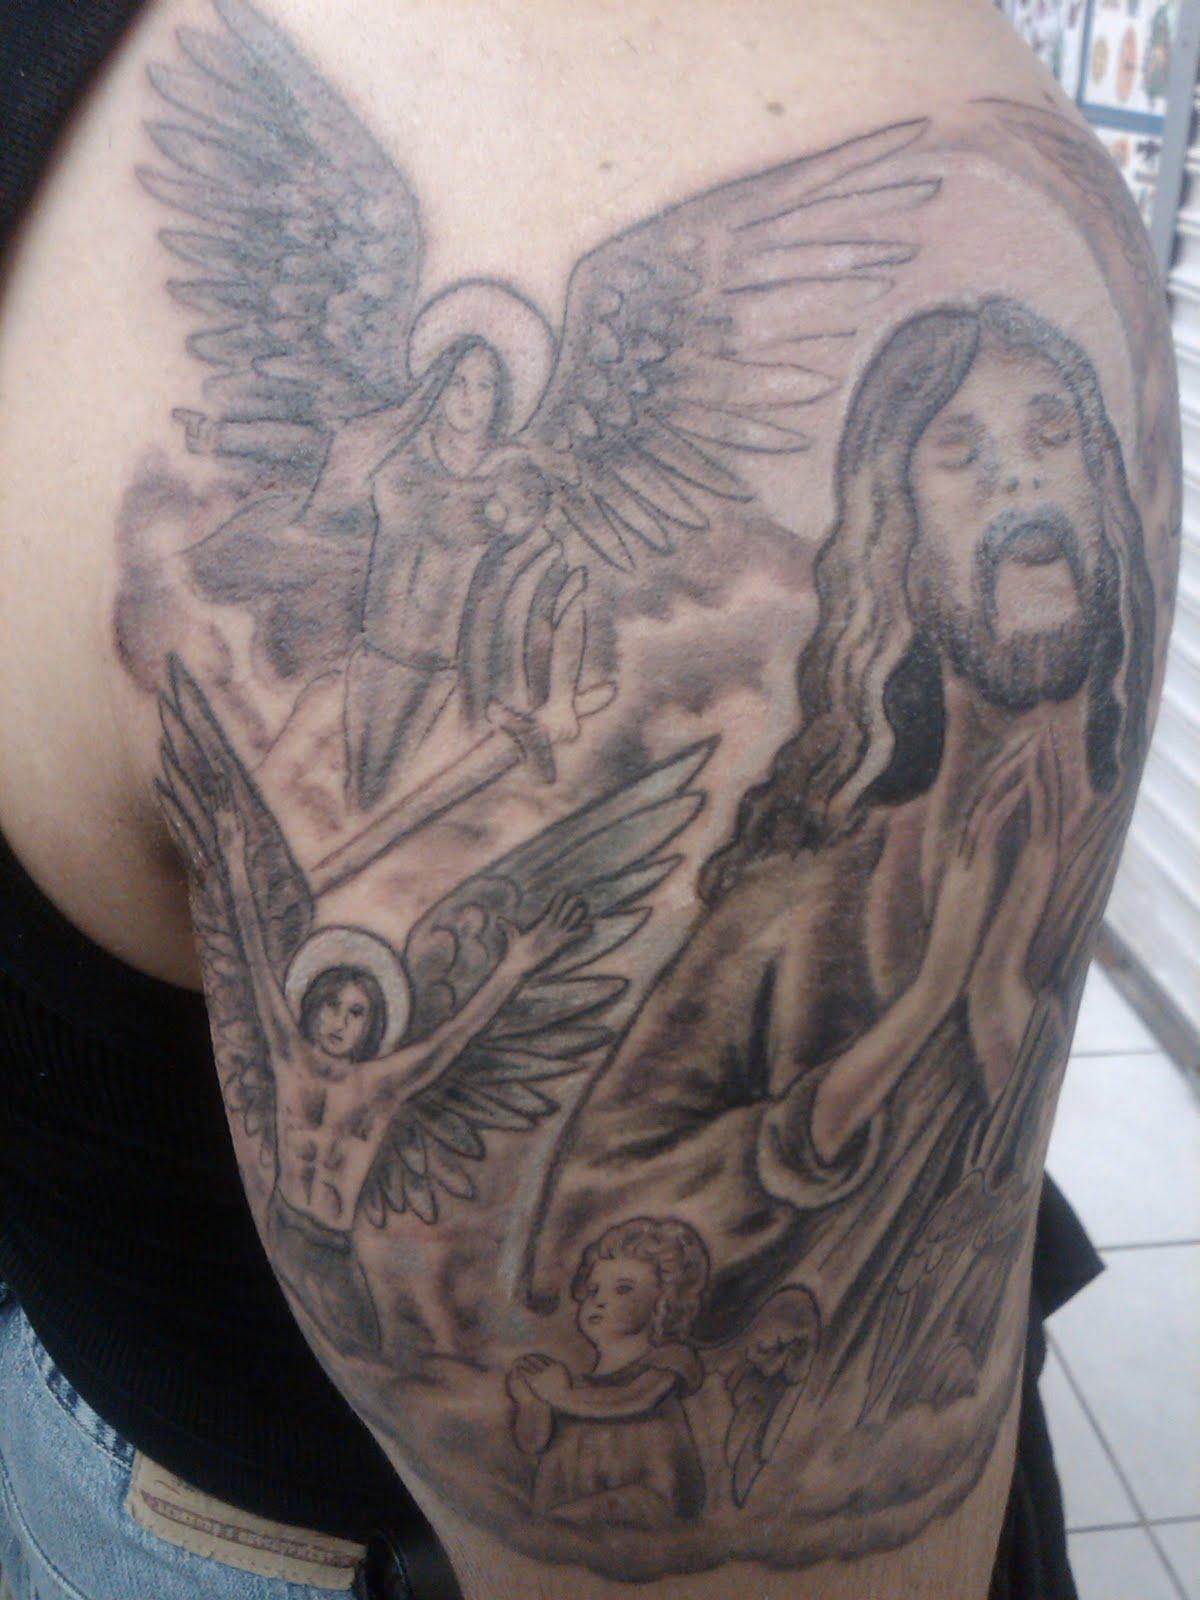 Stunning This Tattoo Artist Uses Real Flowers To Create: Amazing Tattoo Artist Marissa: Tattoos Done By Marissa